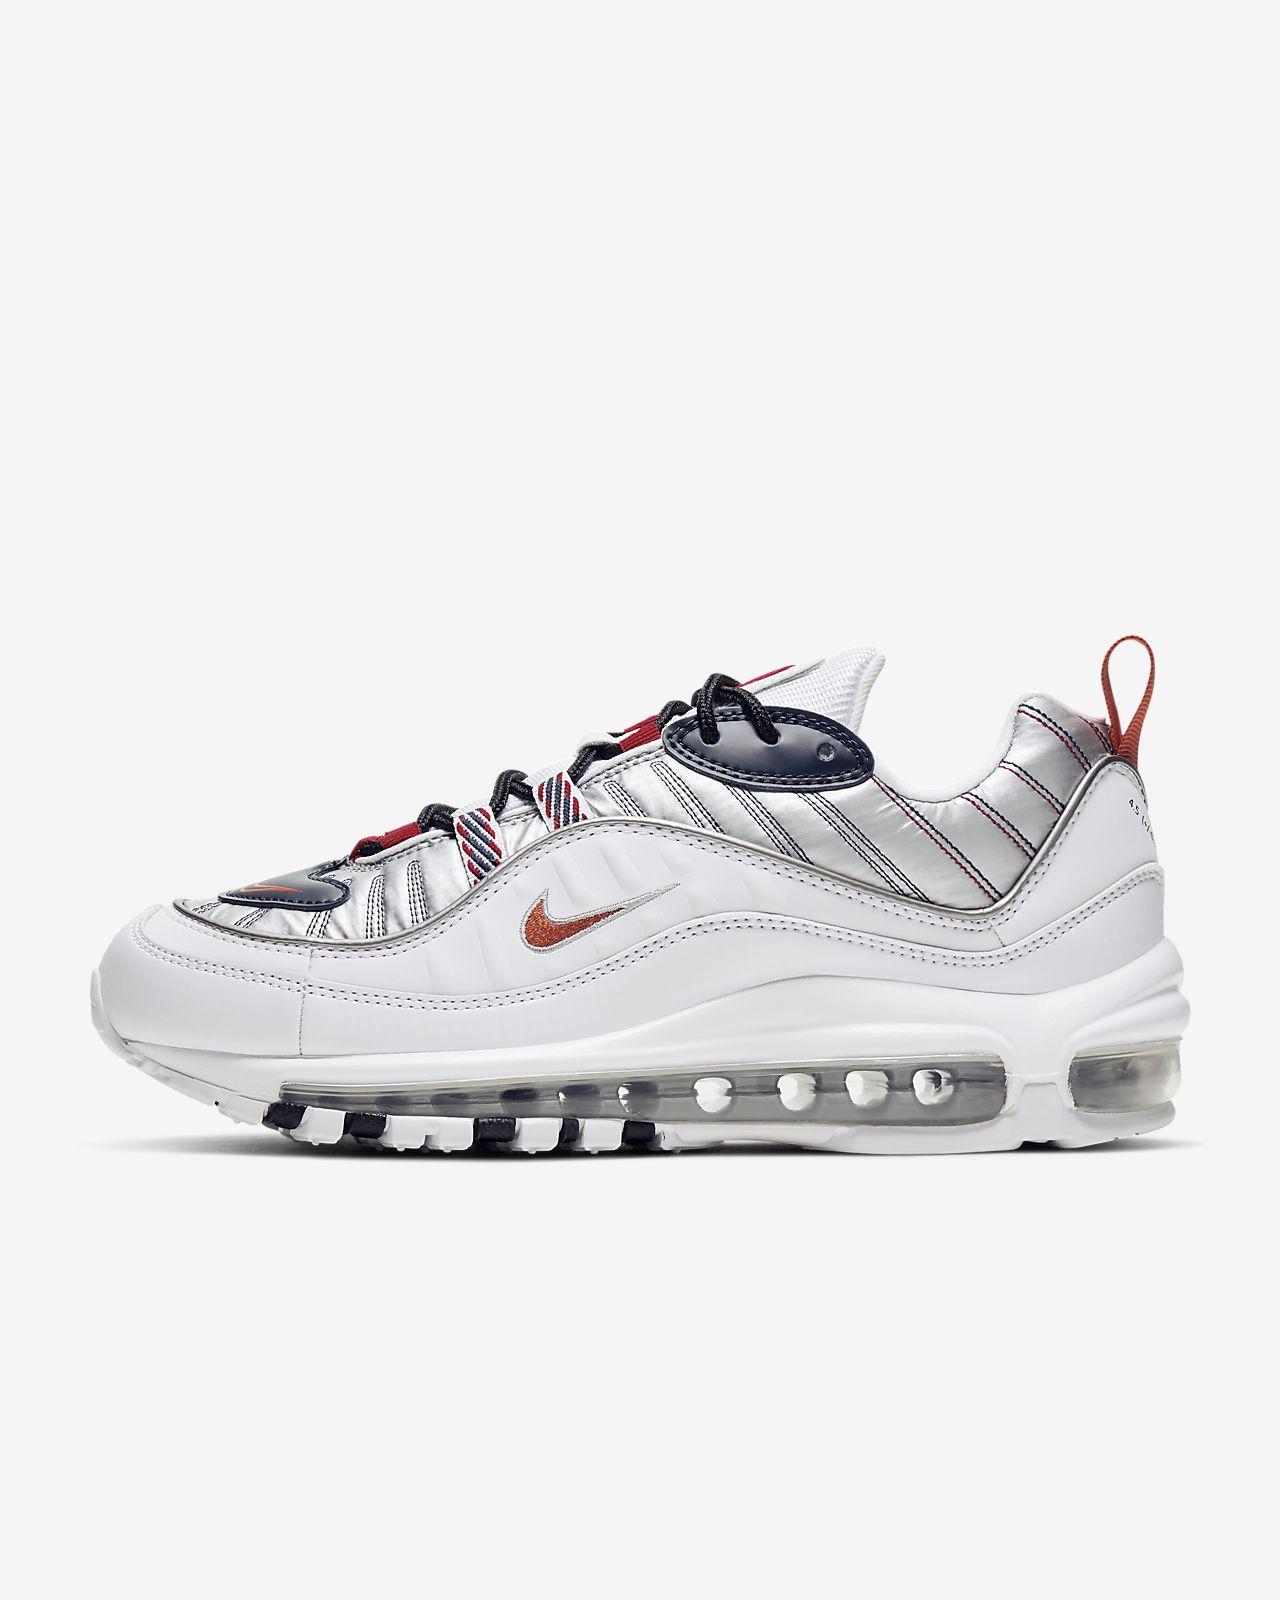 Nike Air Max 98 SE | Size